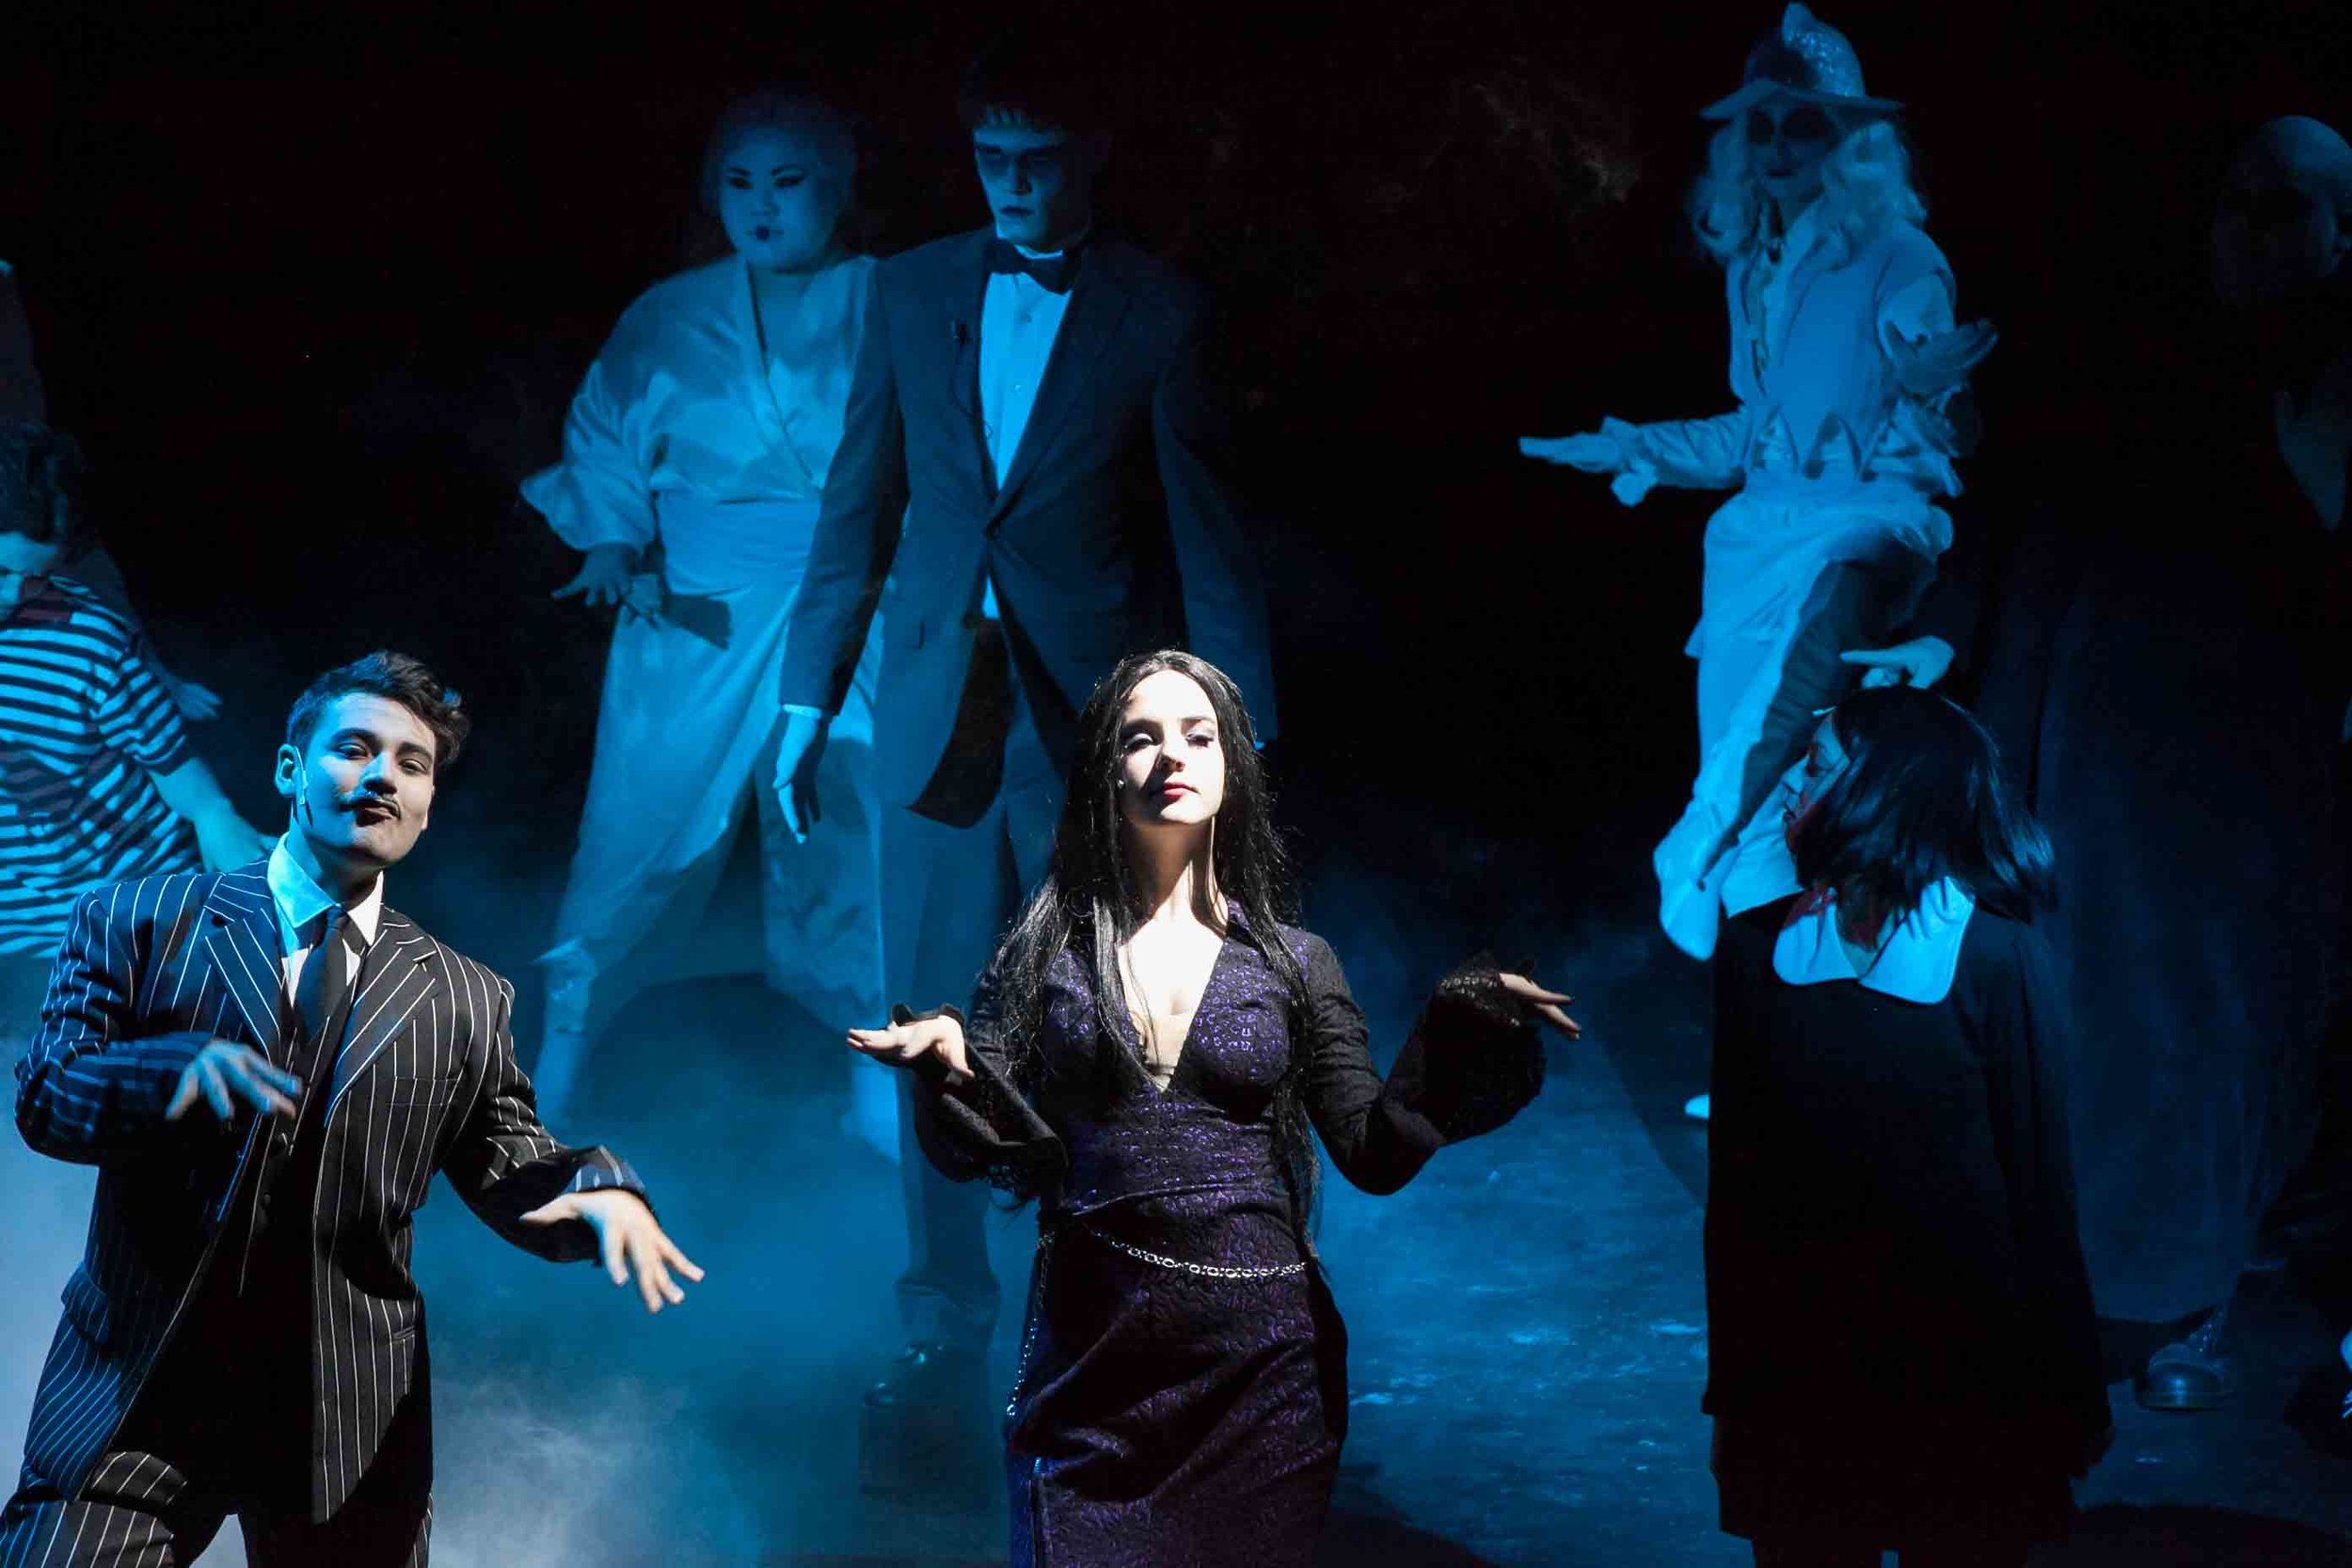 6-19-16 Addams Family Creepy Cast 0049.jpg